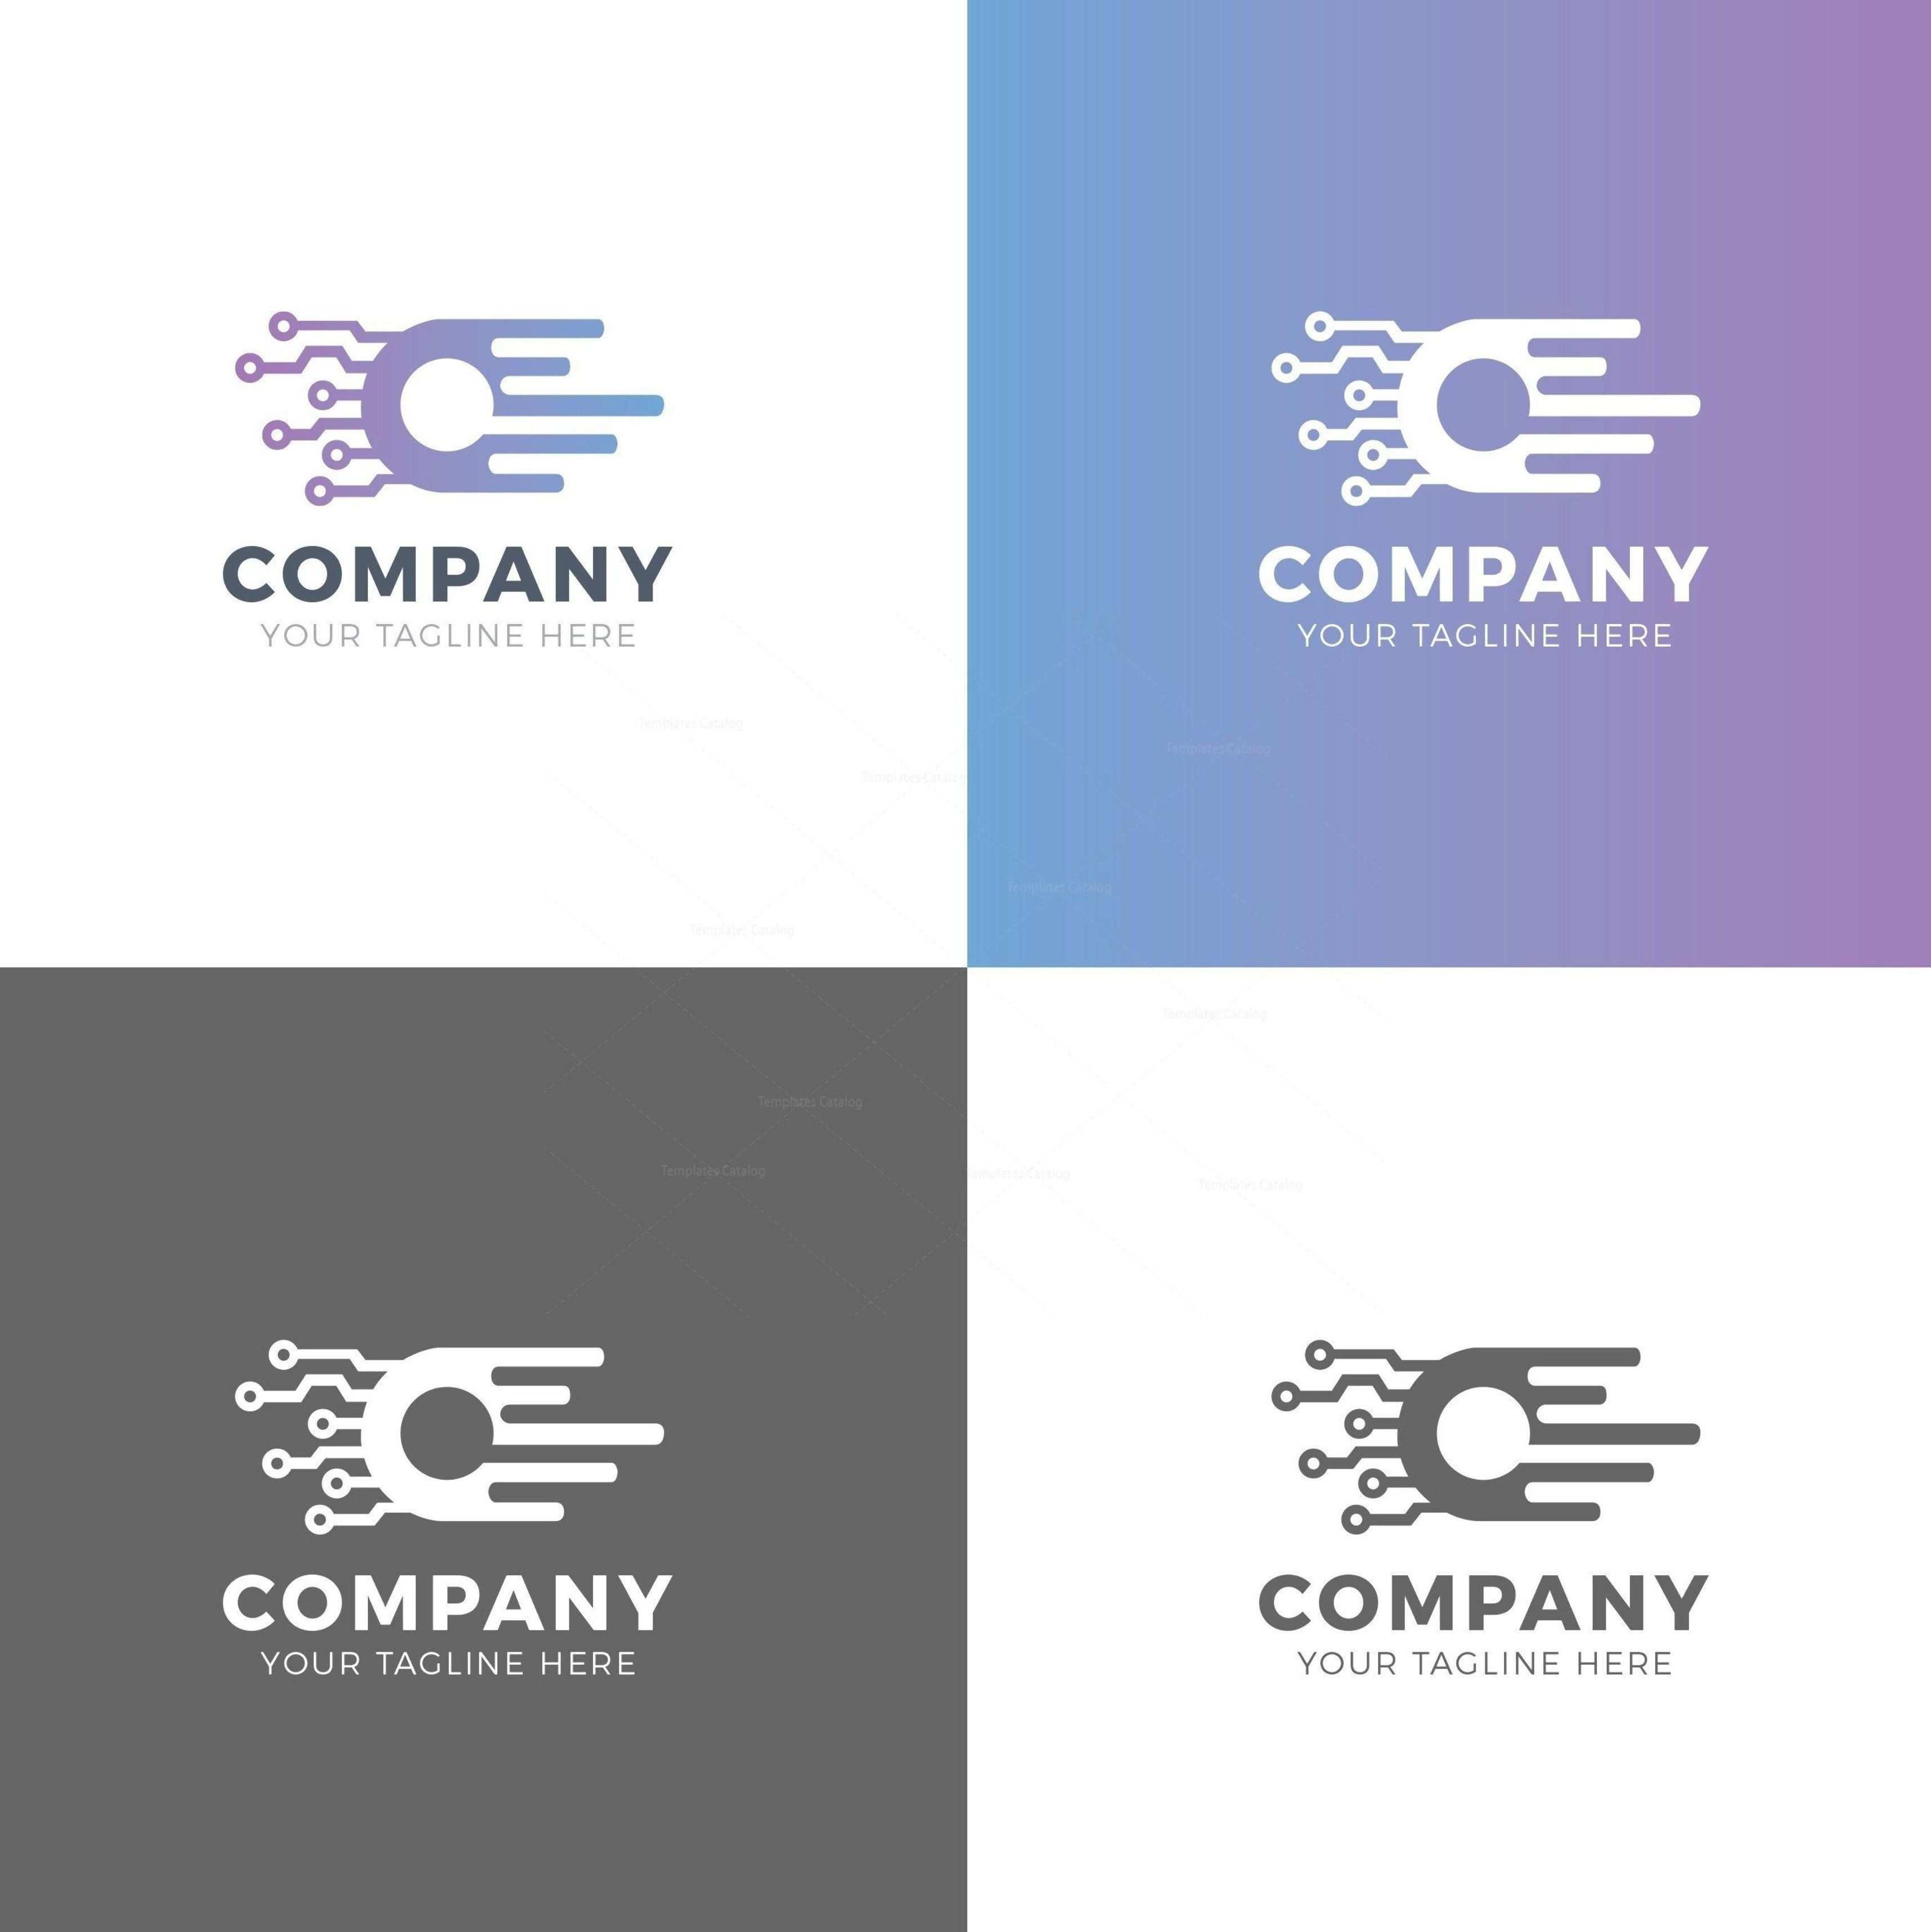 Connection Creative Logo Design Template 19 99 Businesslogotemplate Companylogotemplate Corporatedesignte Kreatives Logo Logo Design Vorlage Logo Entwerfen